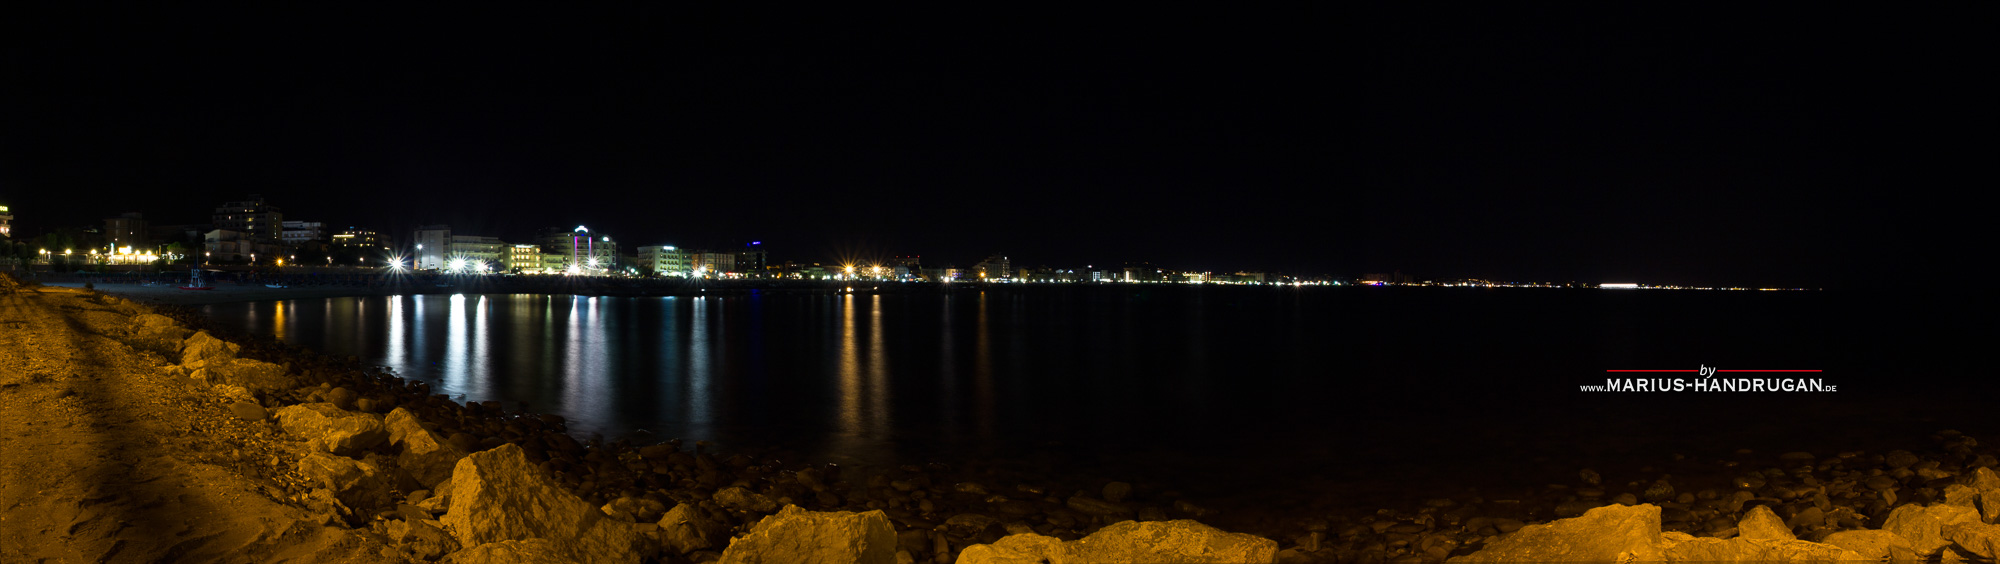 Stadt Panorama am Meer